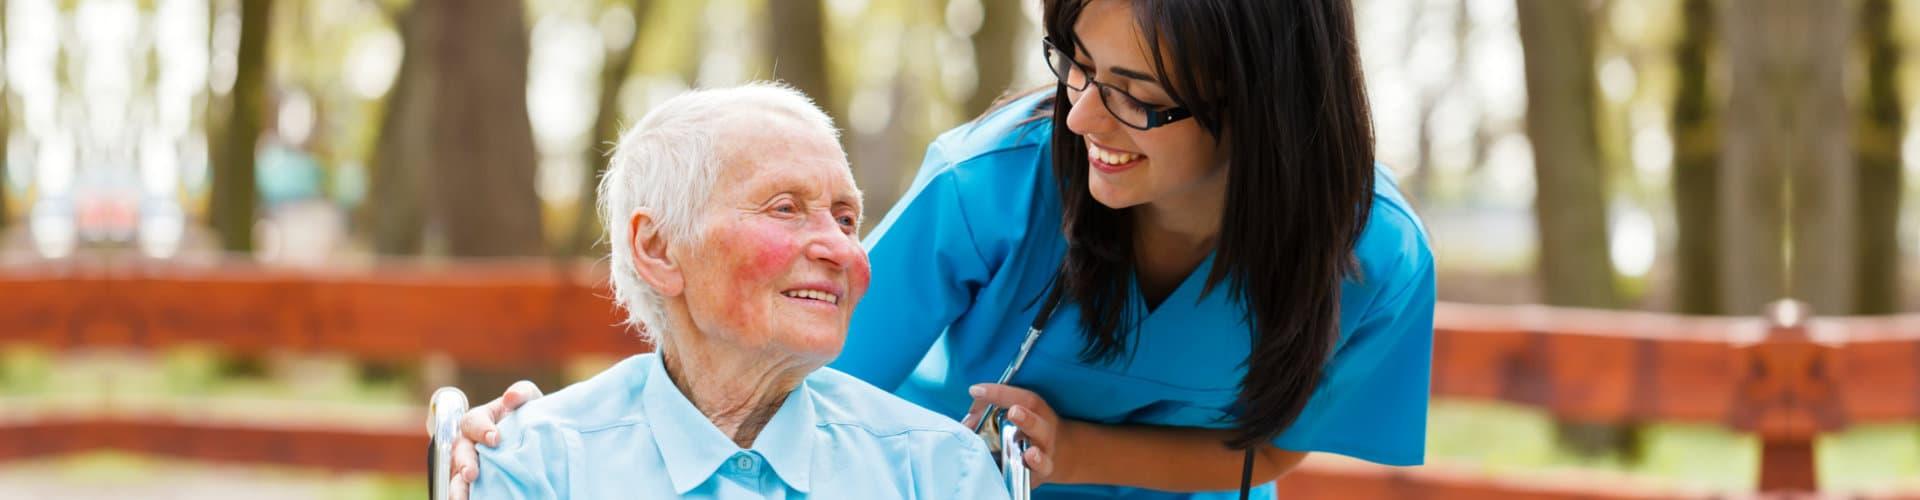 caregiver accompanying her senior patient